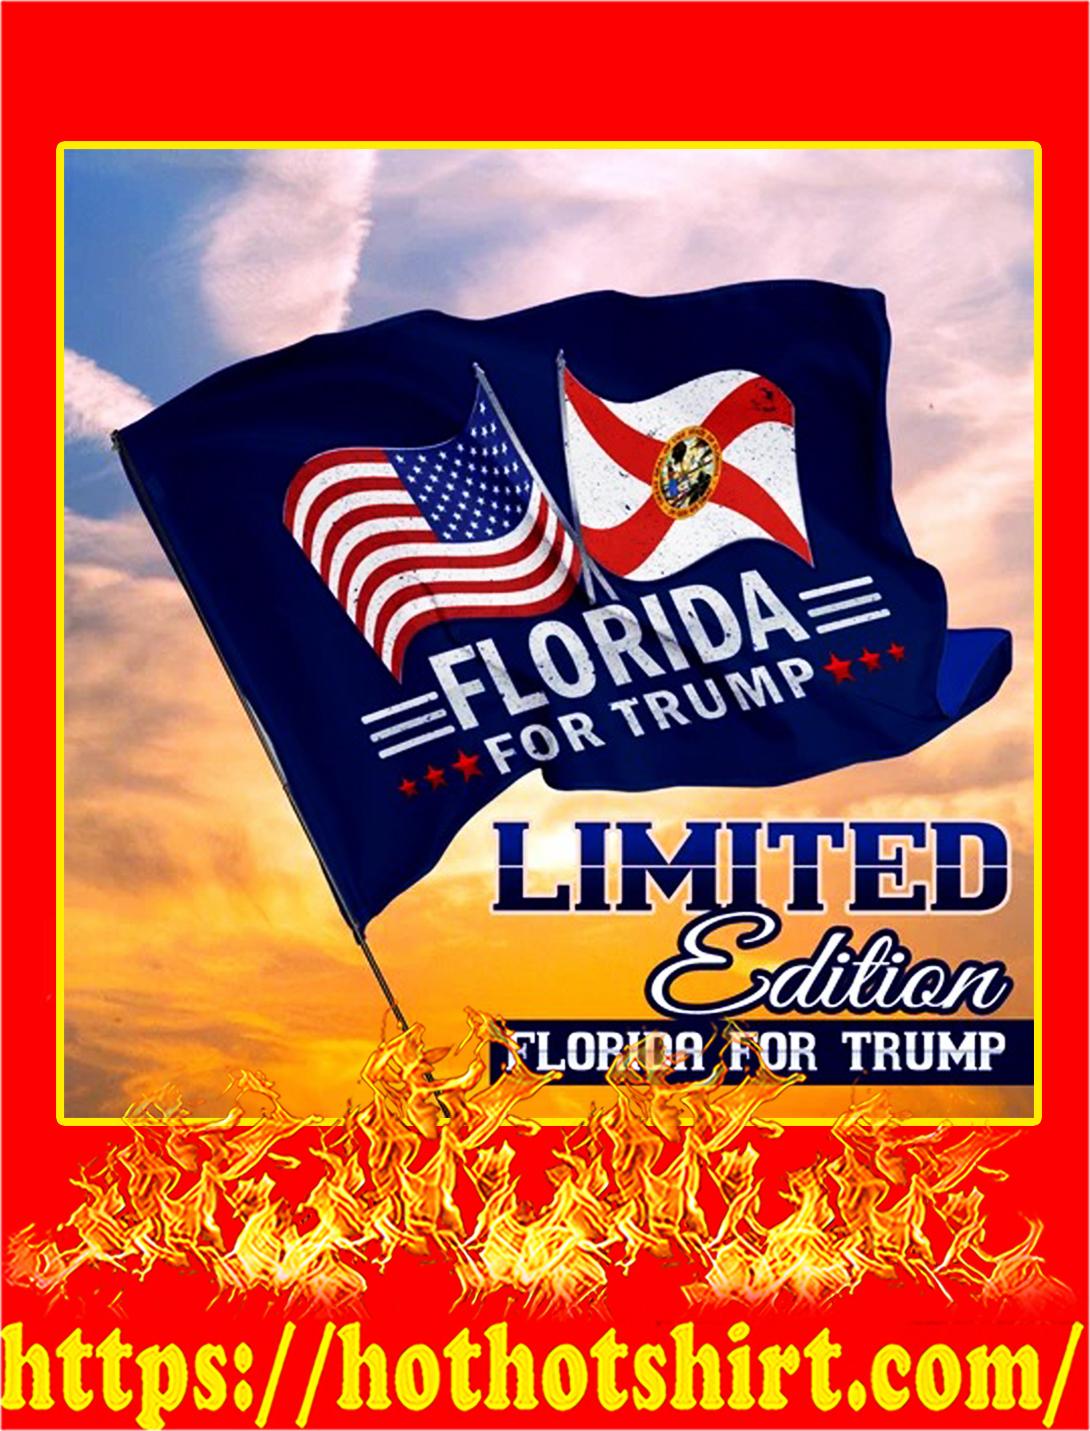 Florida for trump flag- pic 1